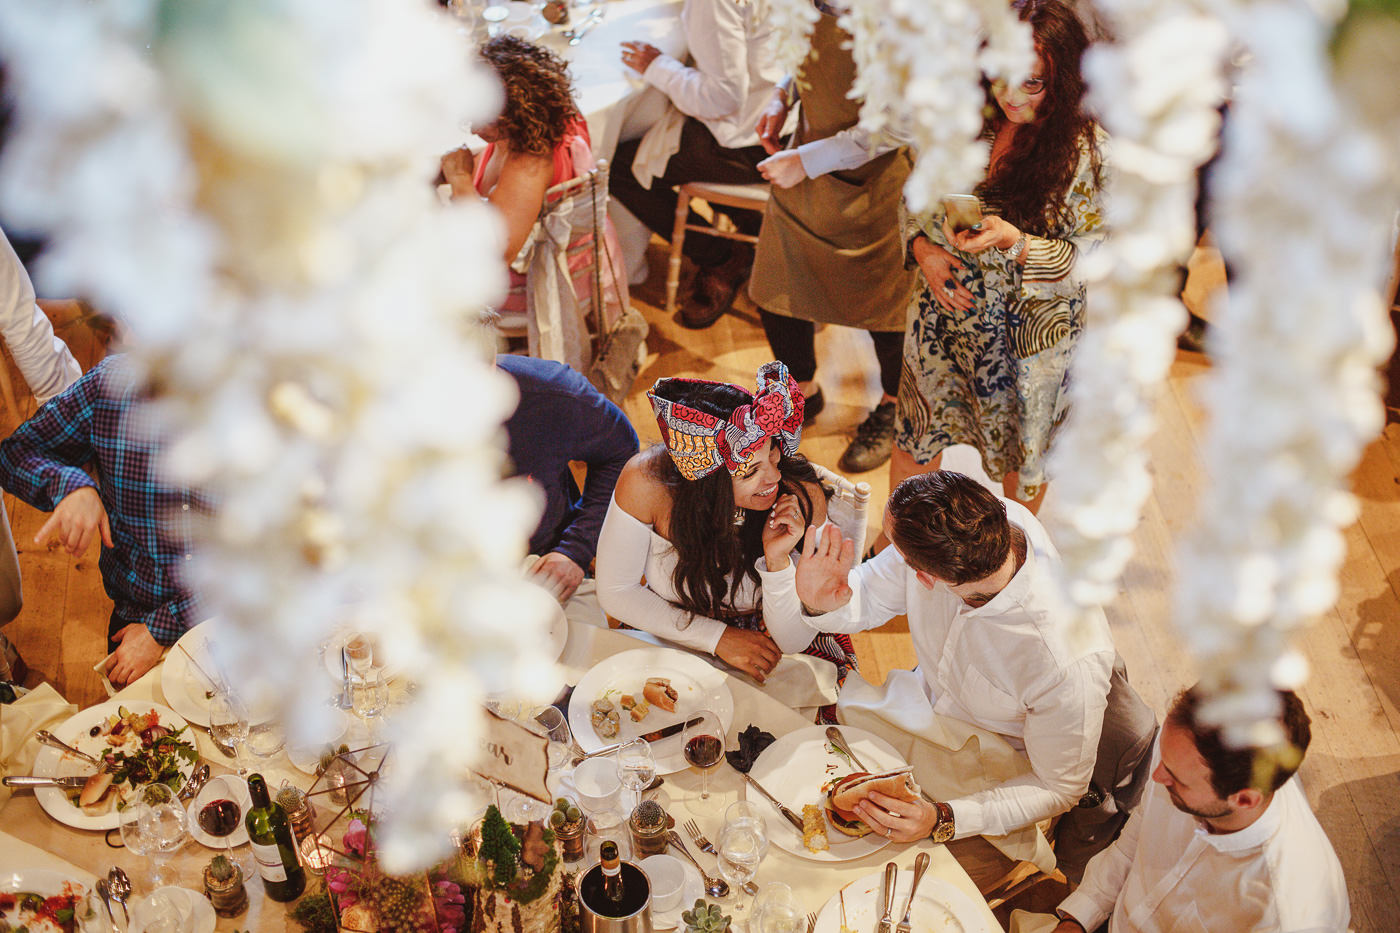 gaynes-park-wedding-photography-53.jpg